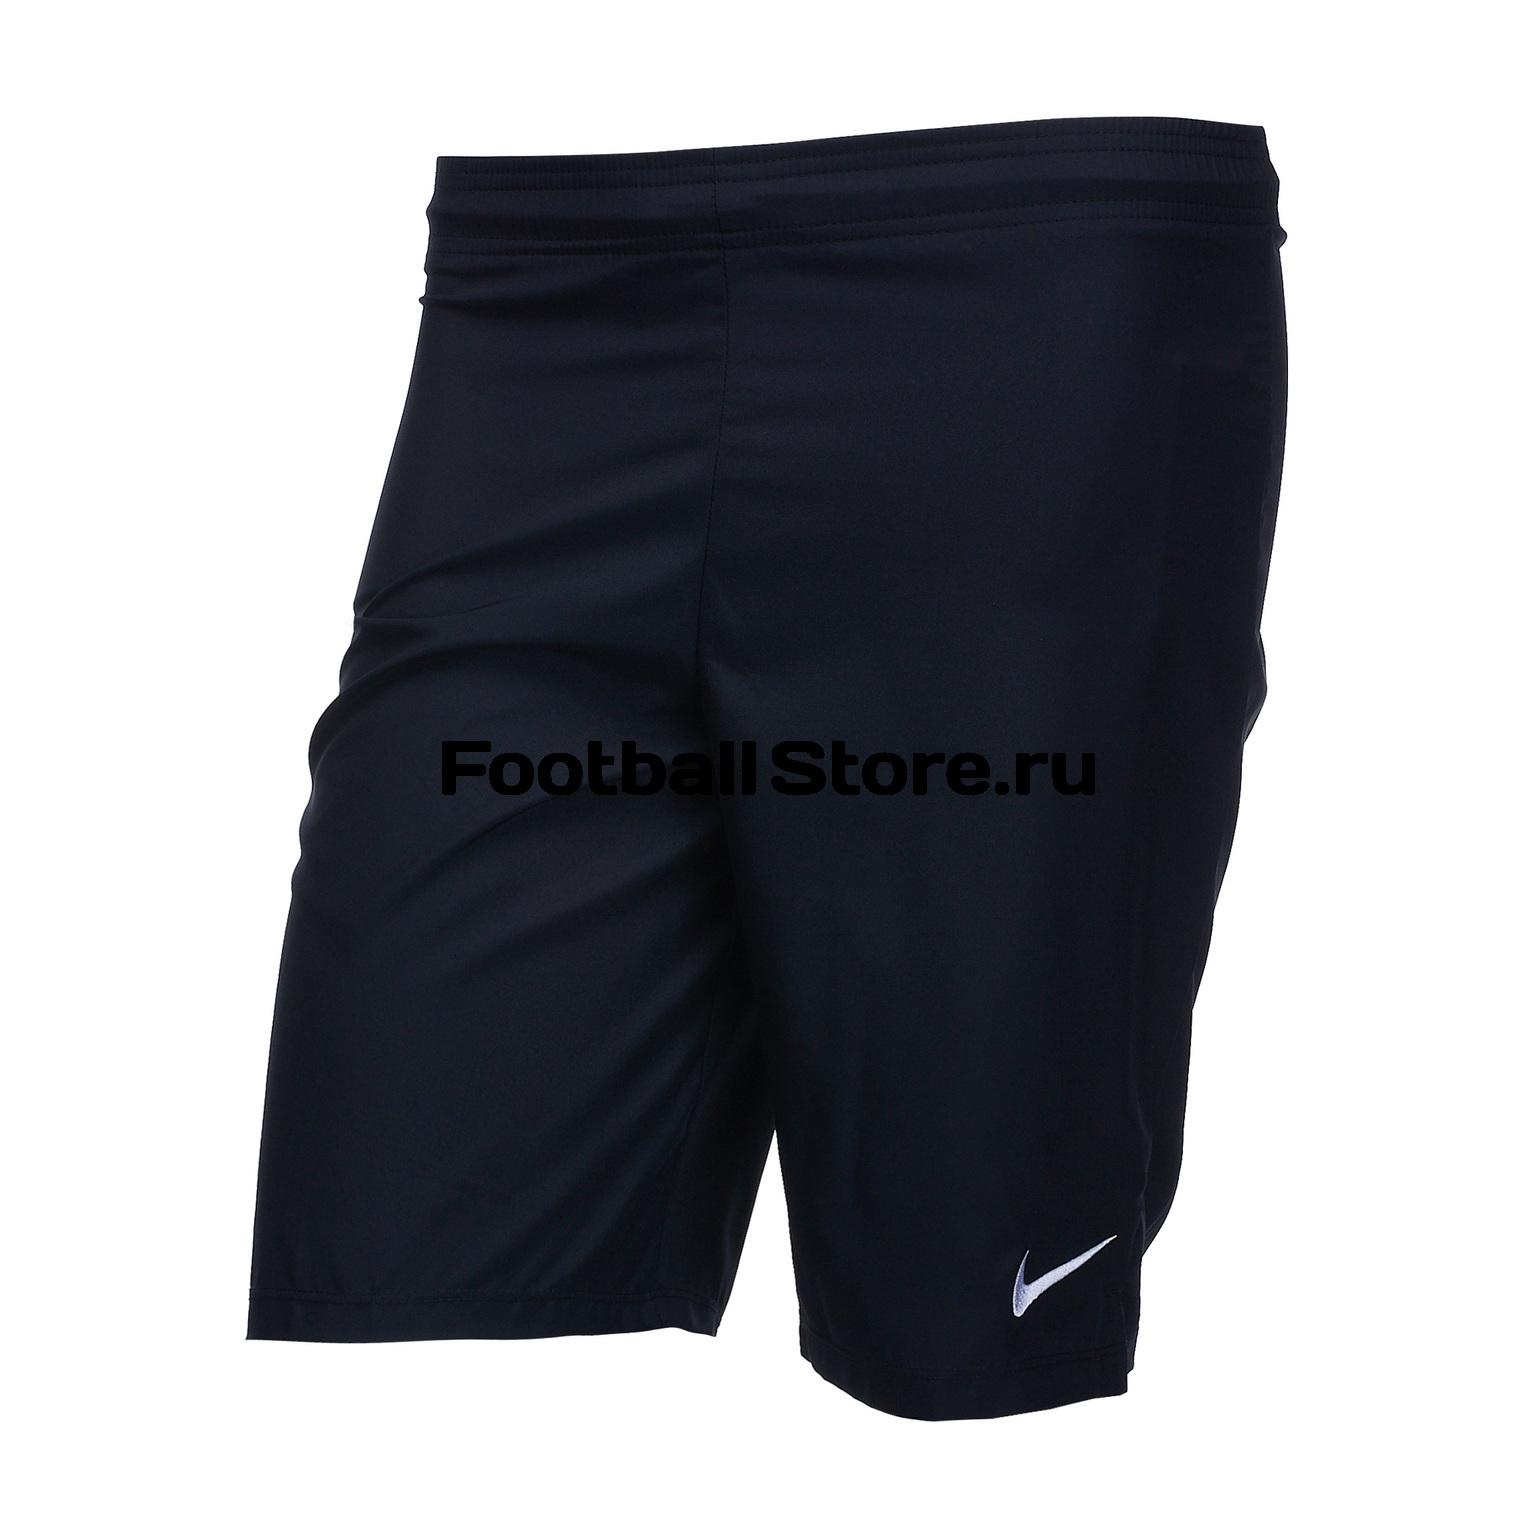 Шорты Nike Laser Woven III Short NB 725901-010